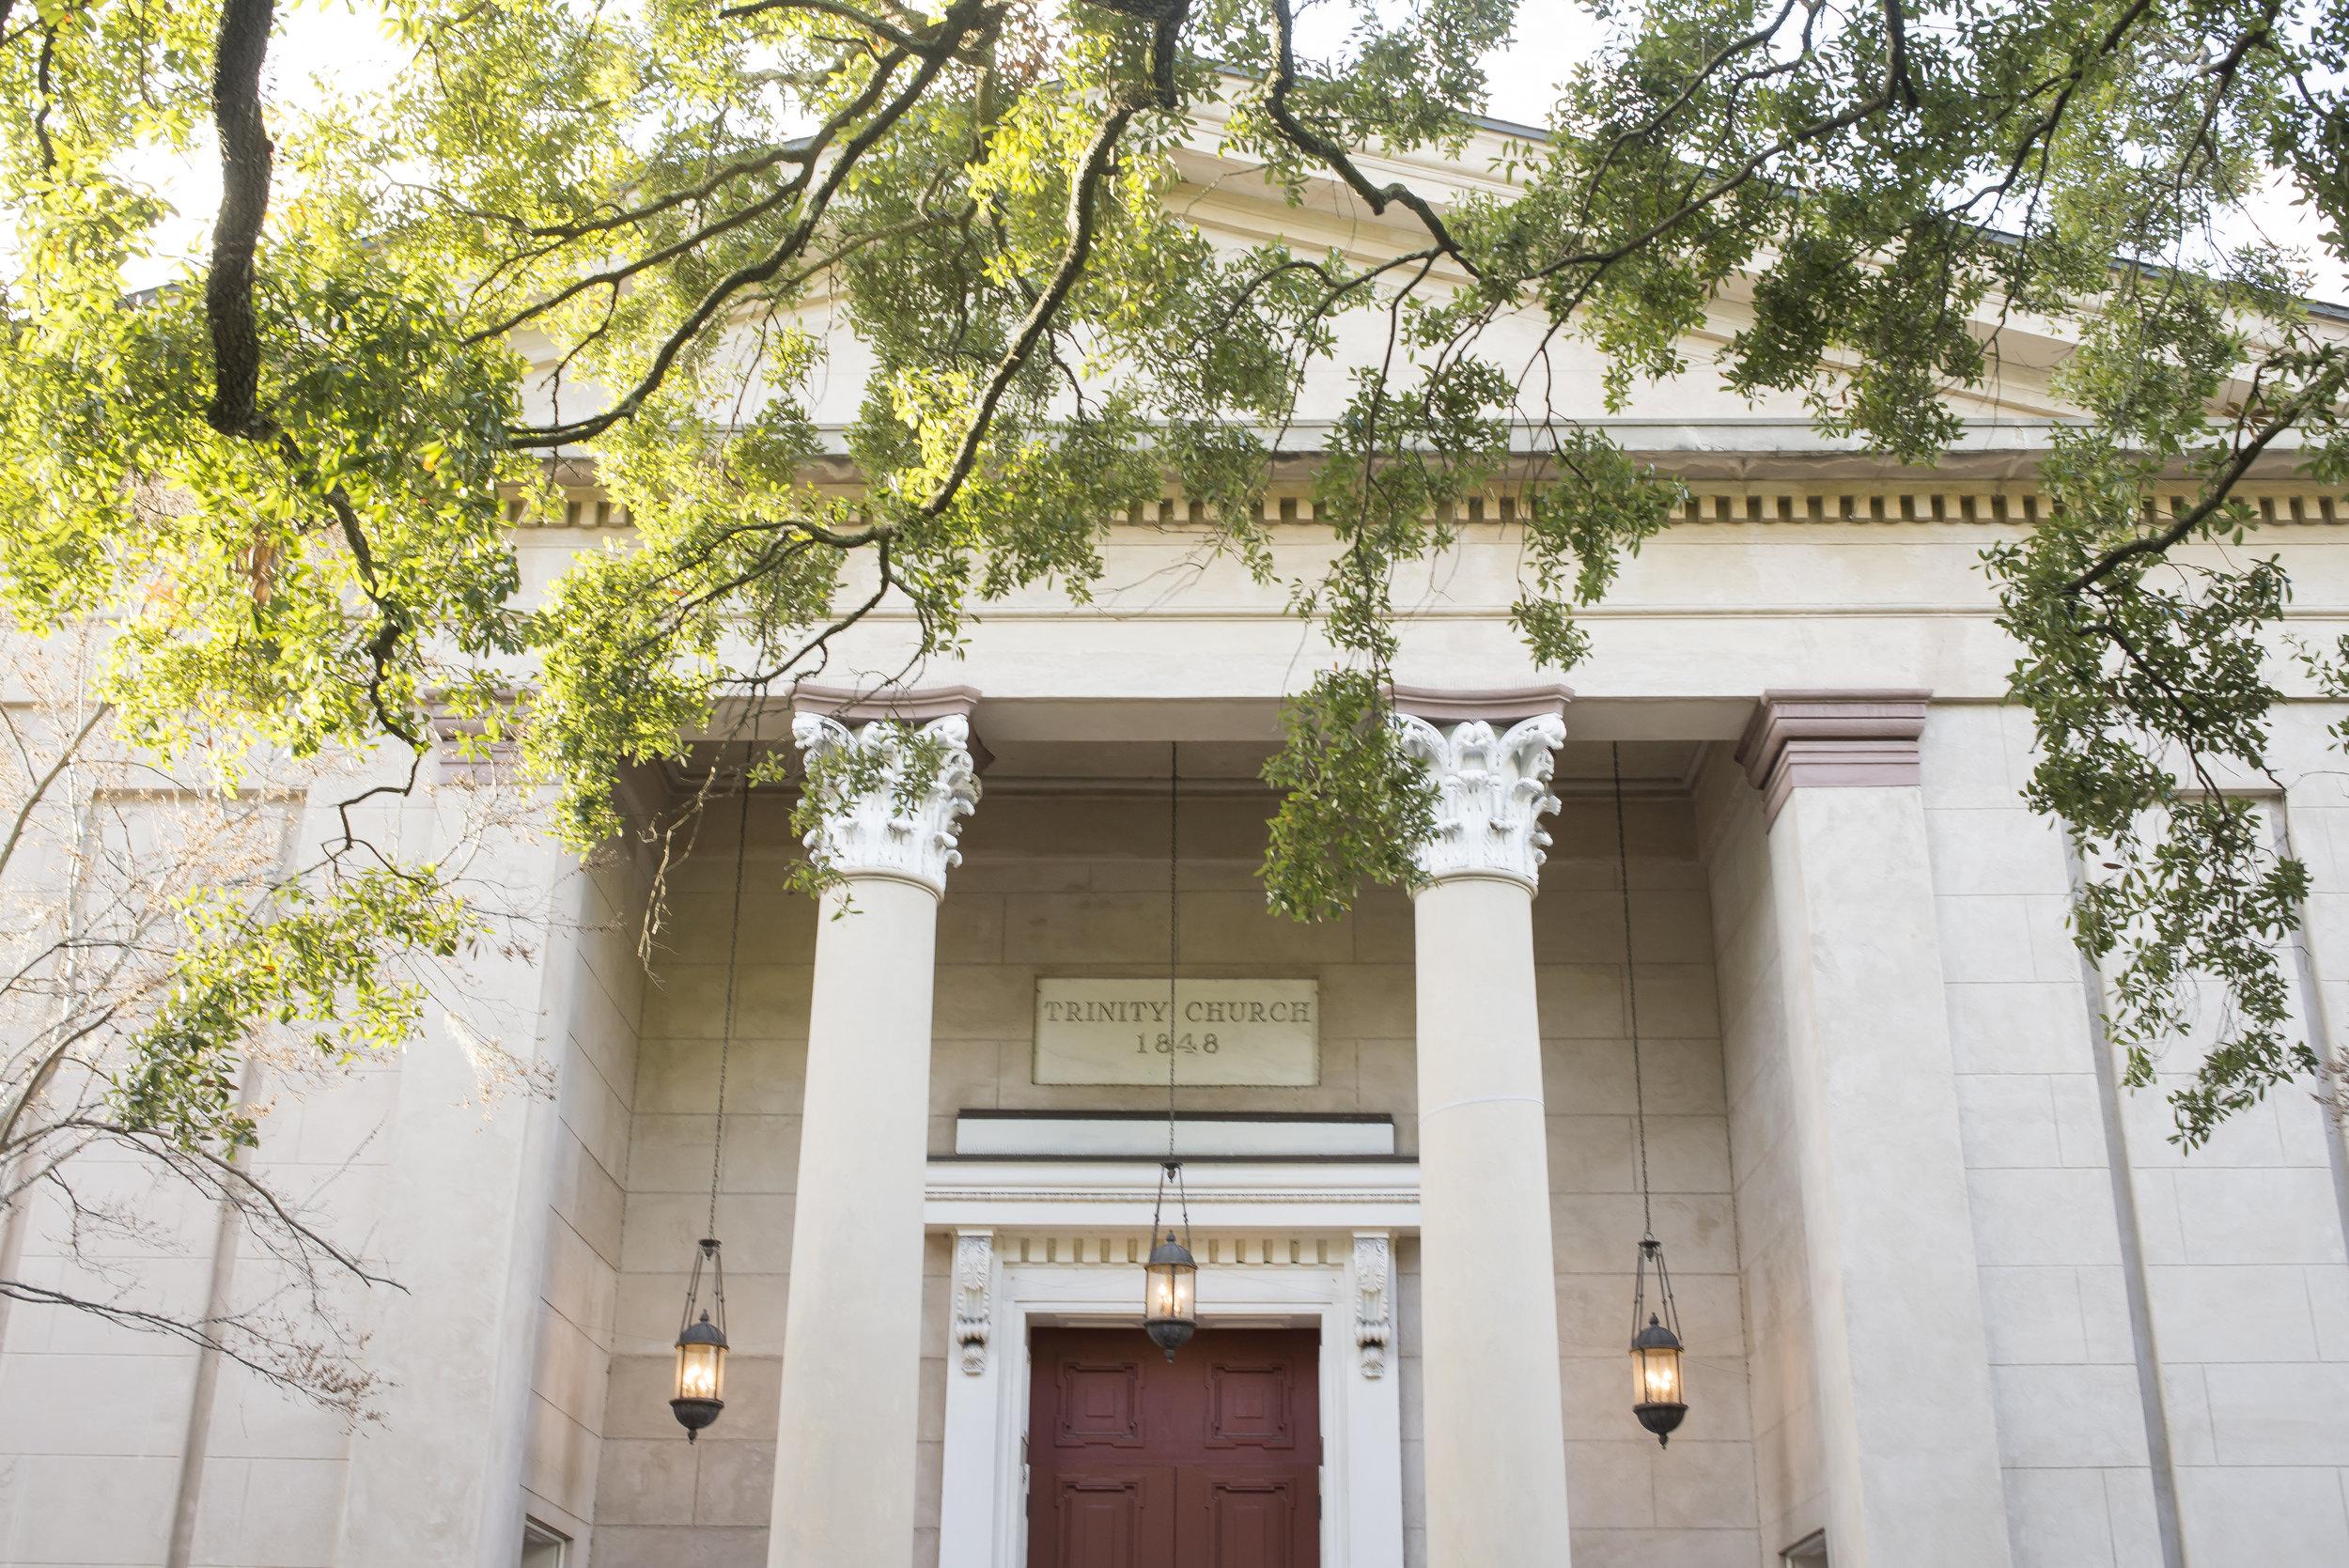 Trinity Church, Savannah, GA | Genteel & Bard